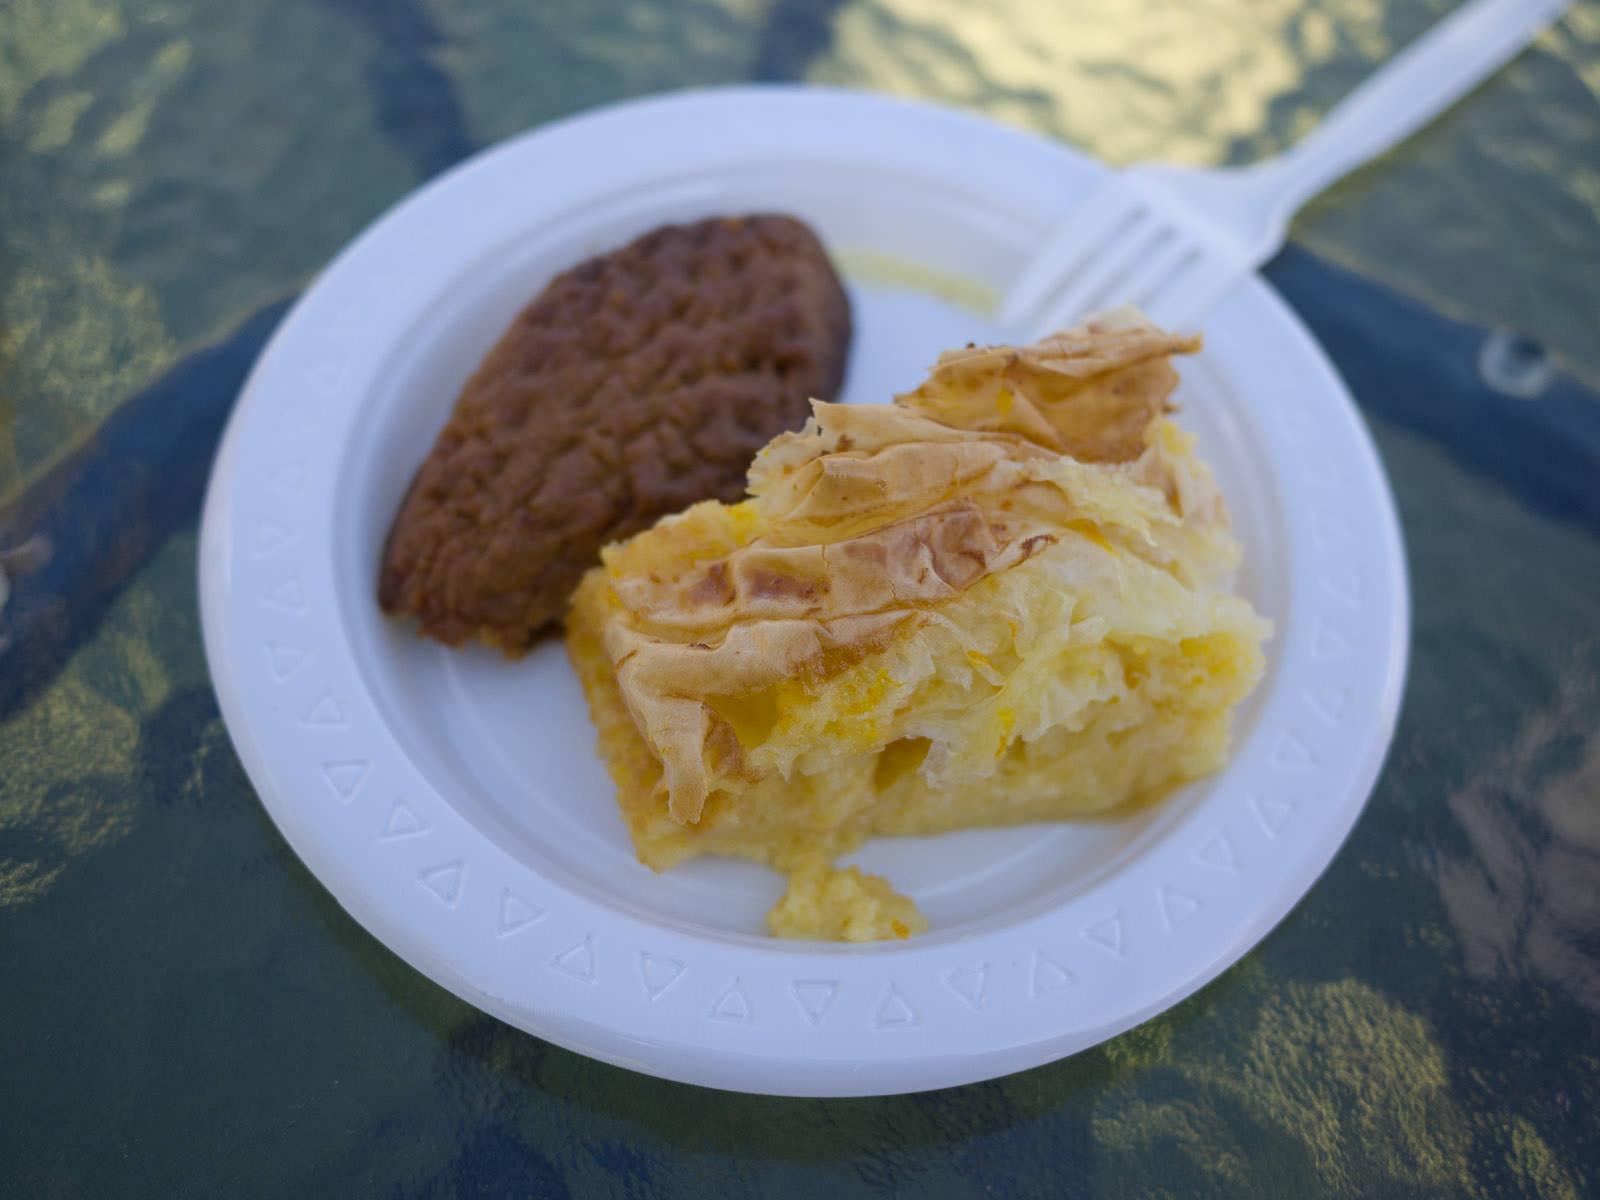 Melomakarona (honey syrup cookie) and portokalopita (orange yoghurt cake)